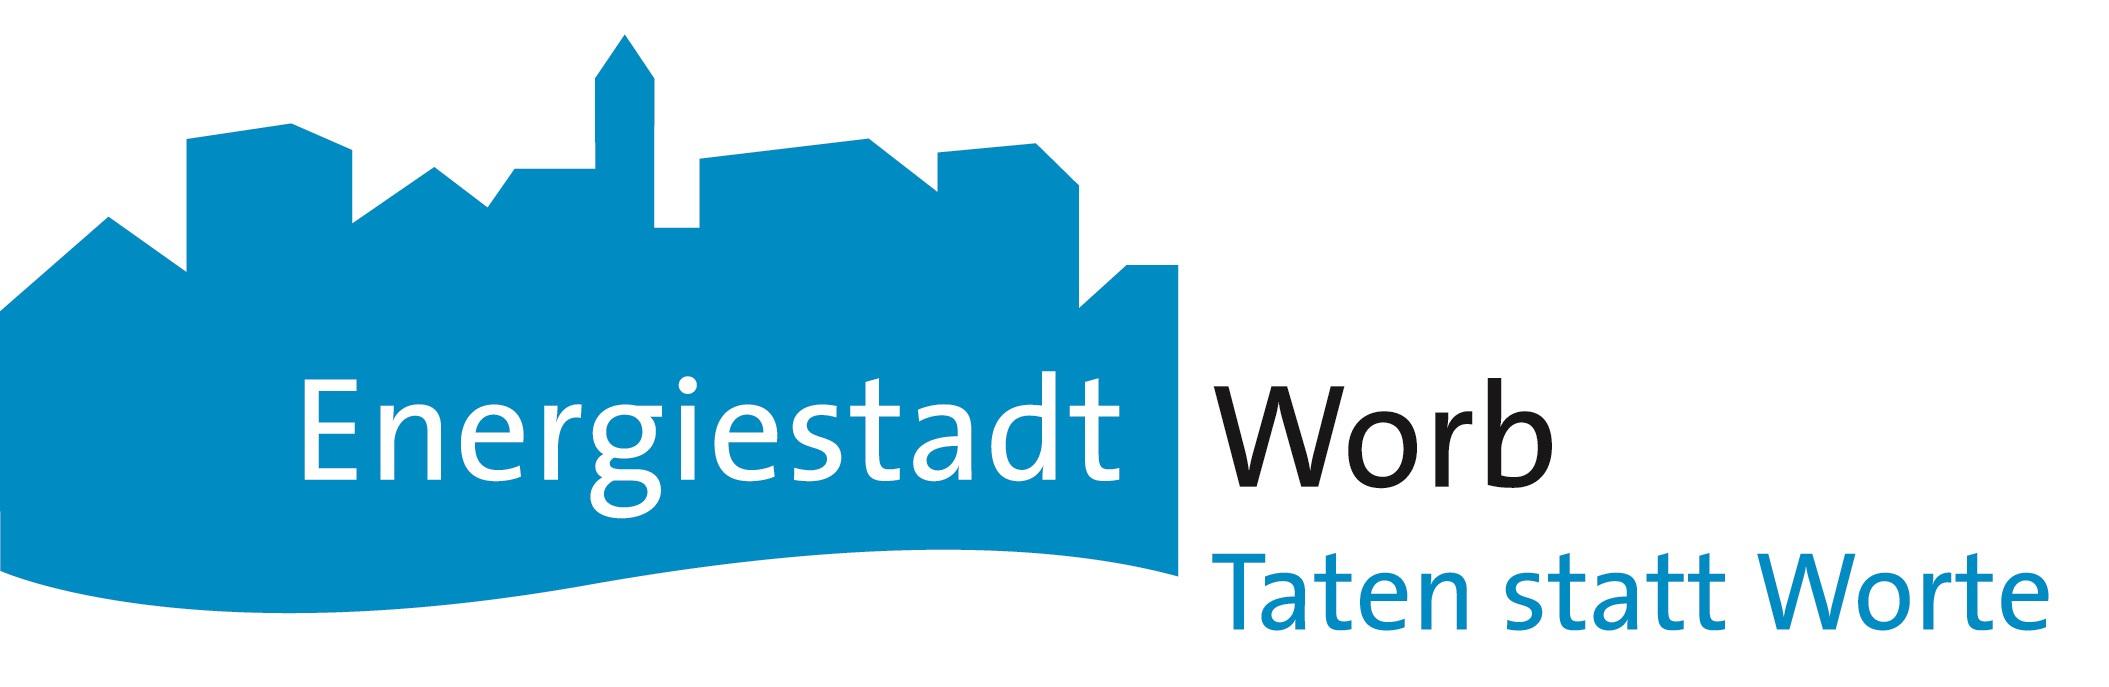 Energiestadt Worb